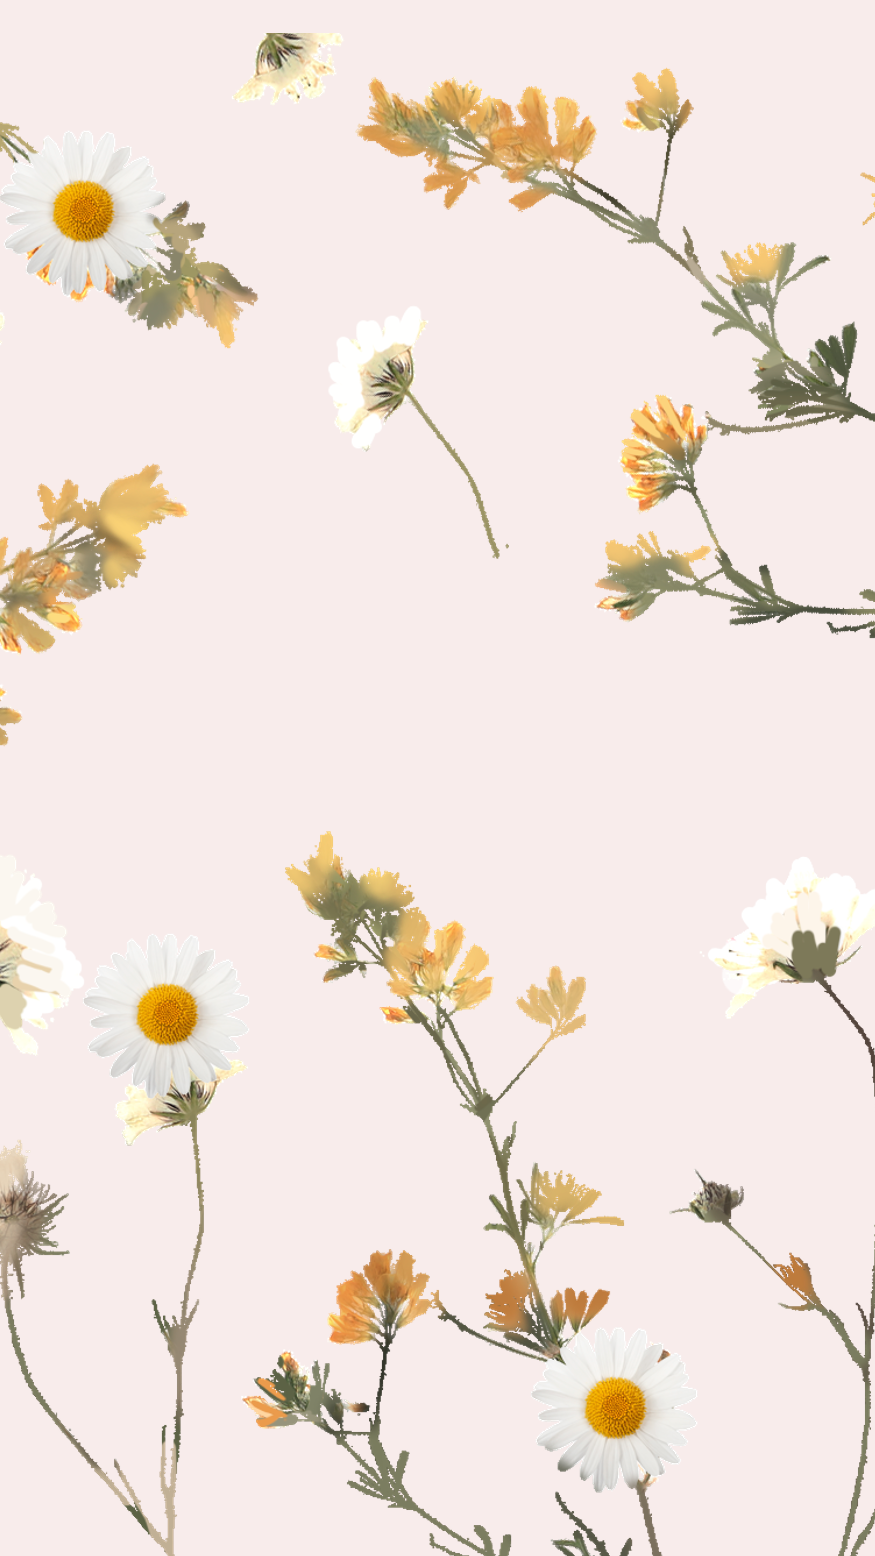 Wallpaper Bem Me Quer by Gocase #lockscreeniphone